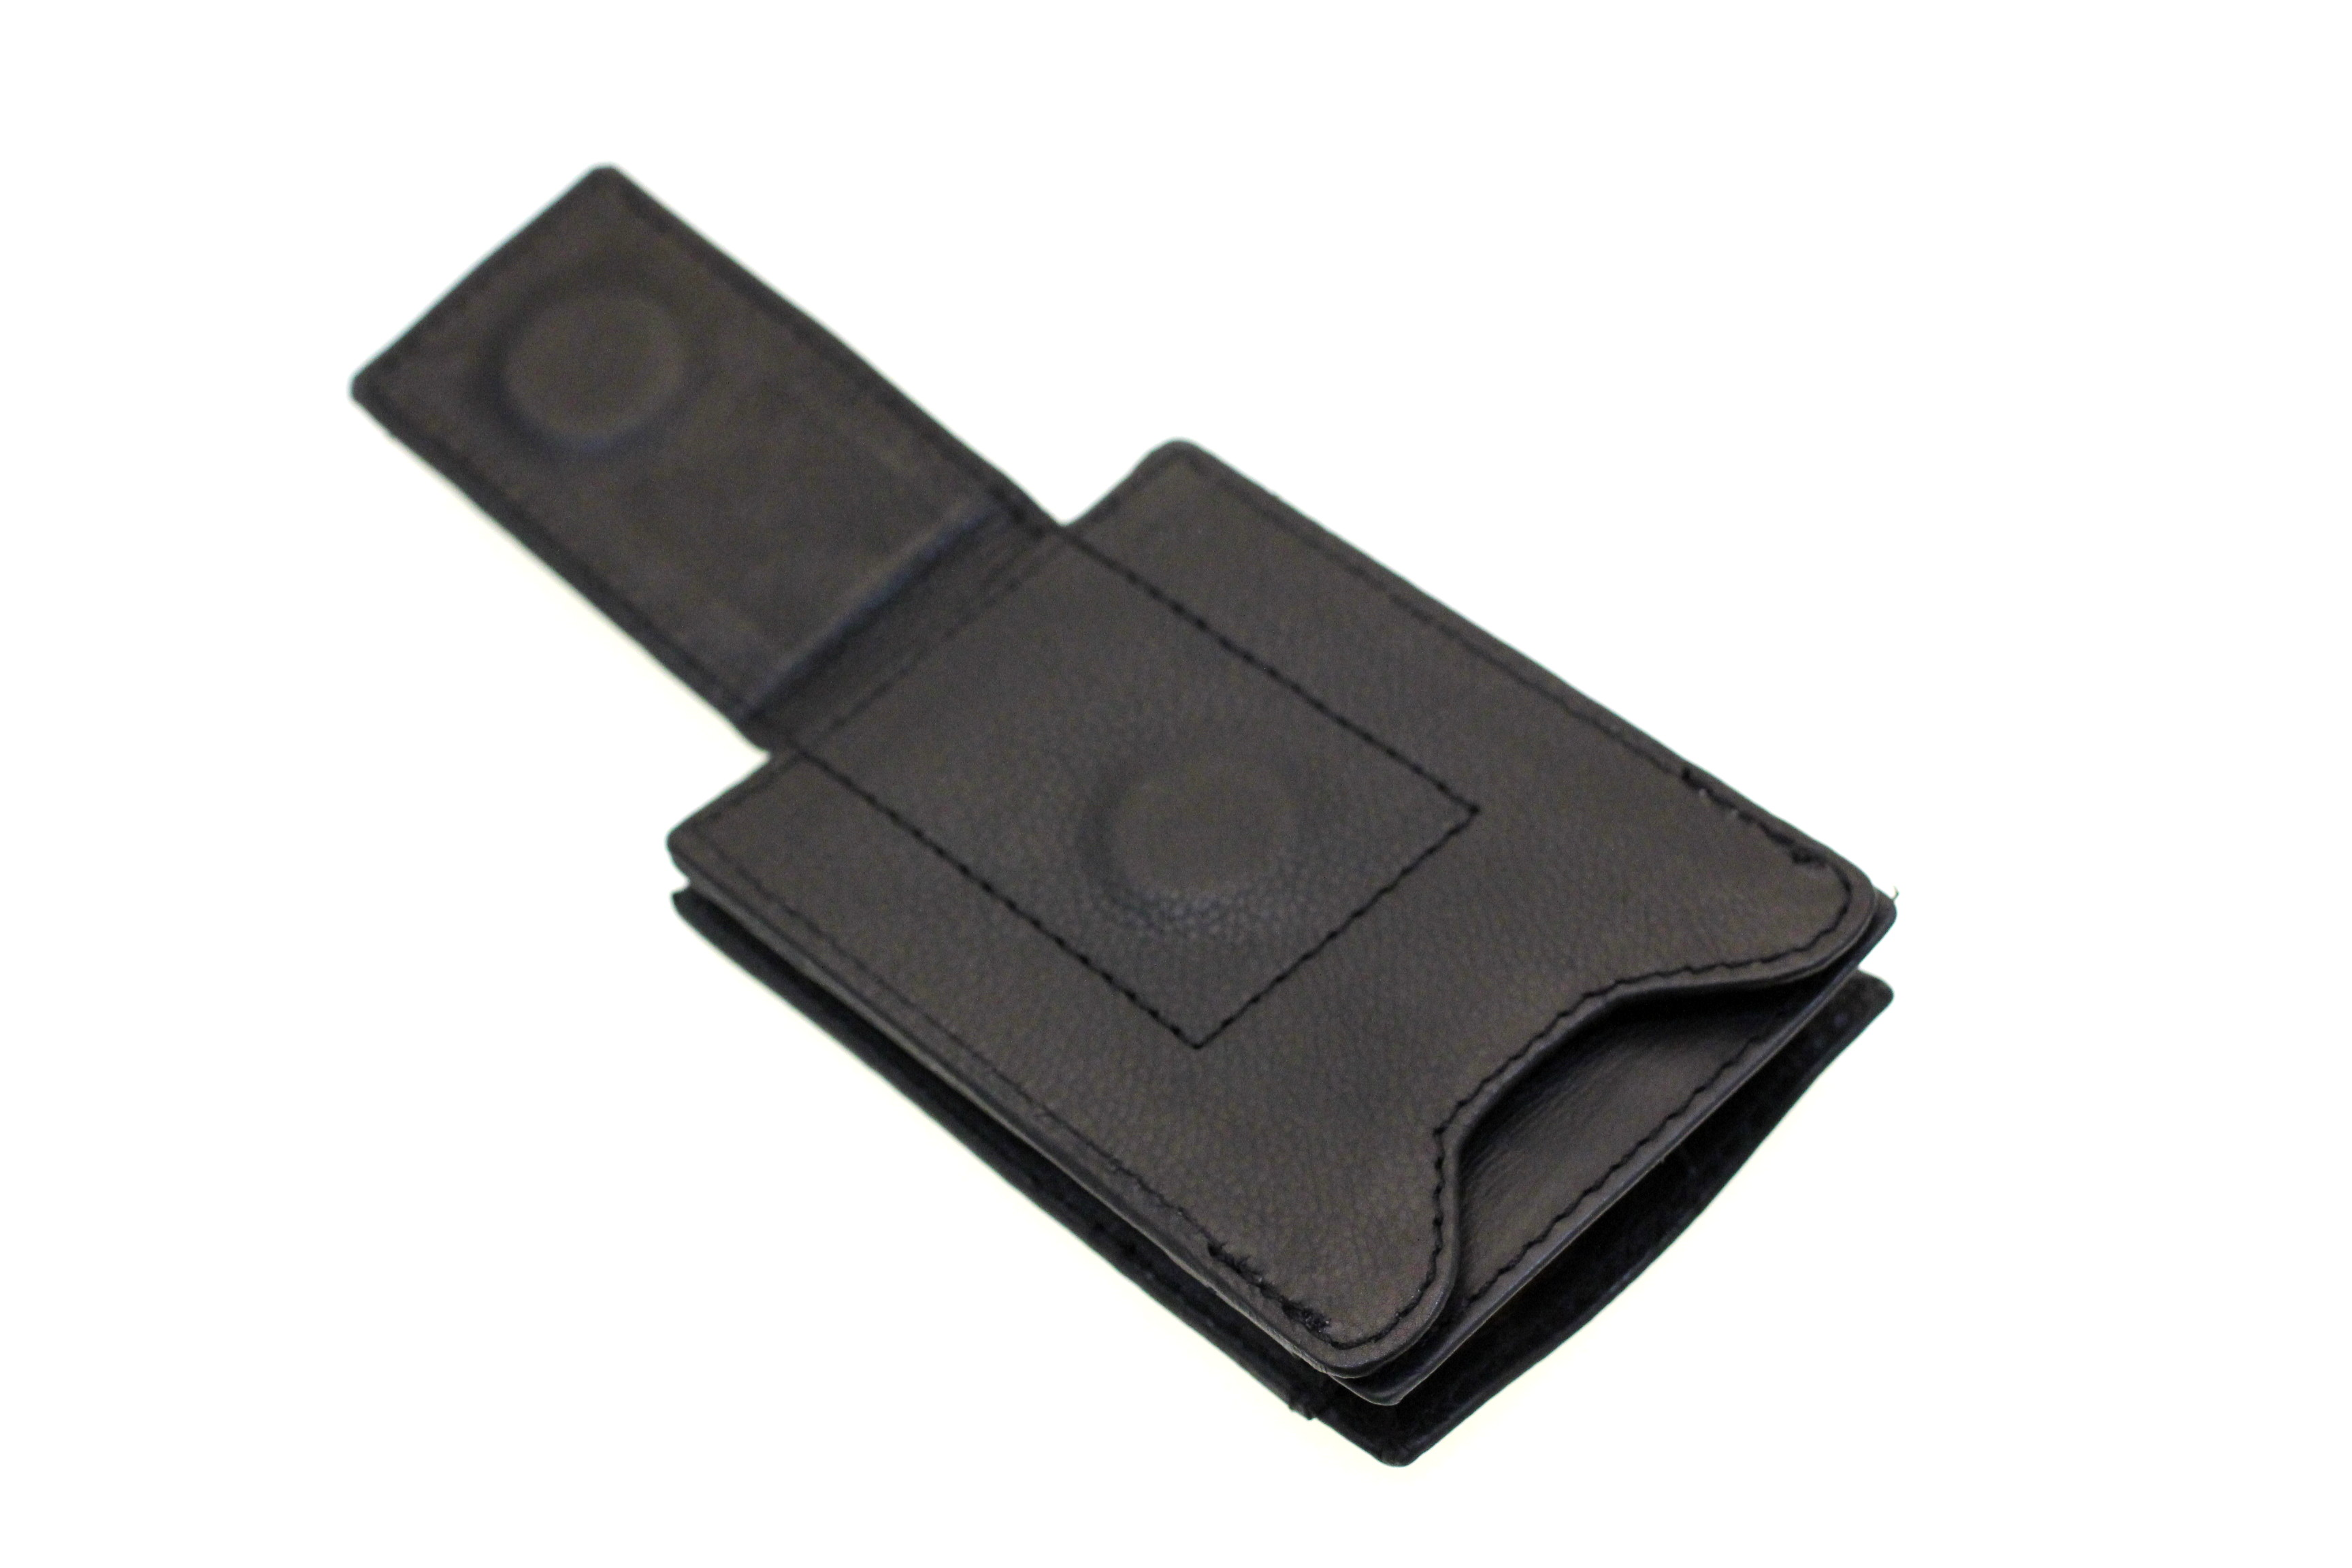 designer money clip wallet 7ueq  Mens-Money-Clip-Wallet-Magnetic-Expandable-Pocket-ID